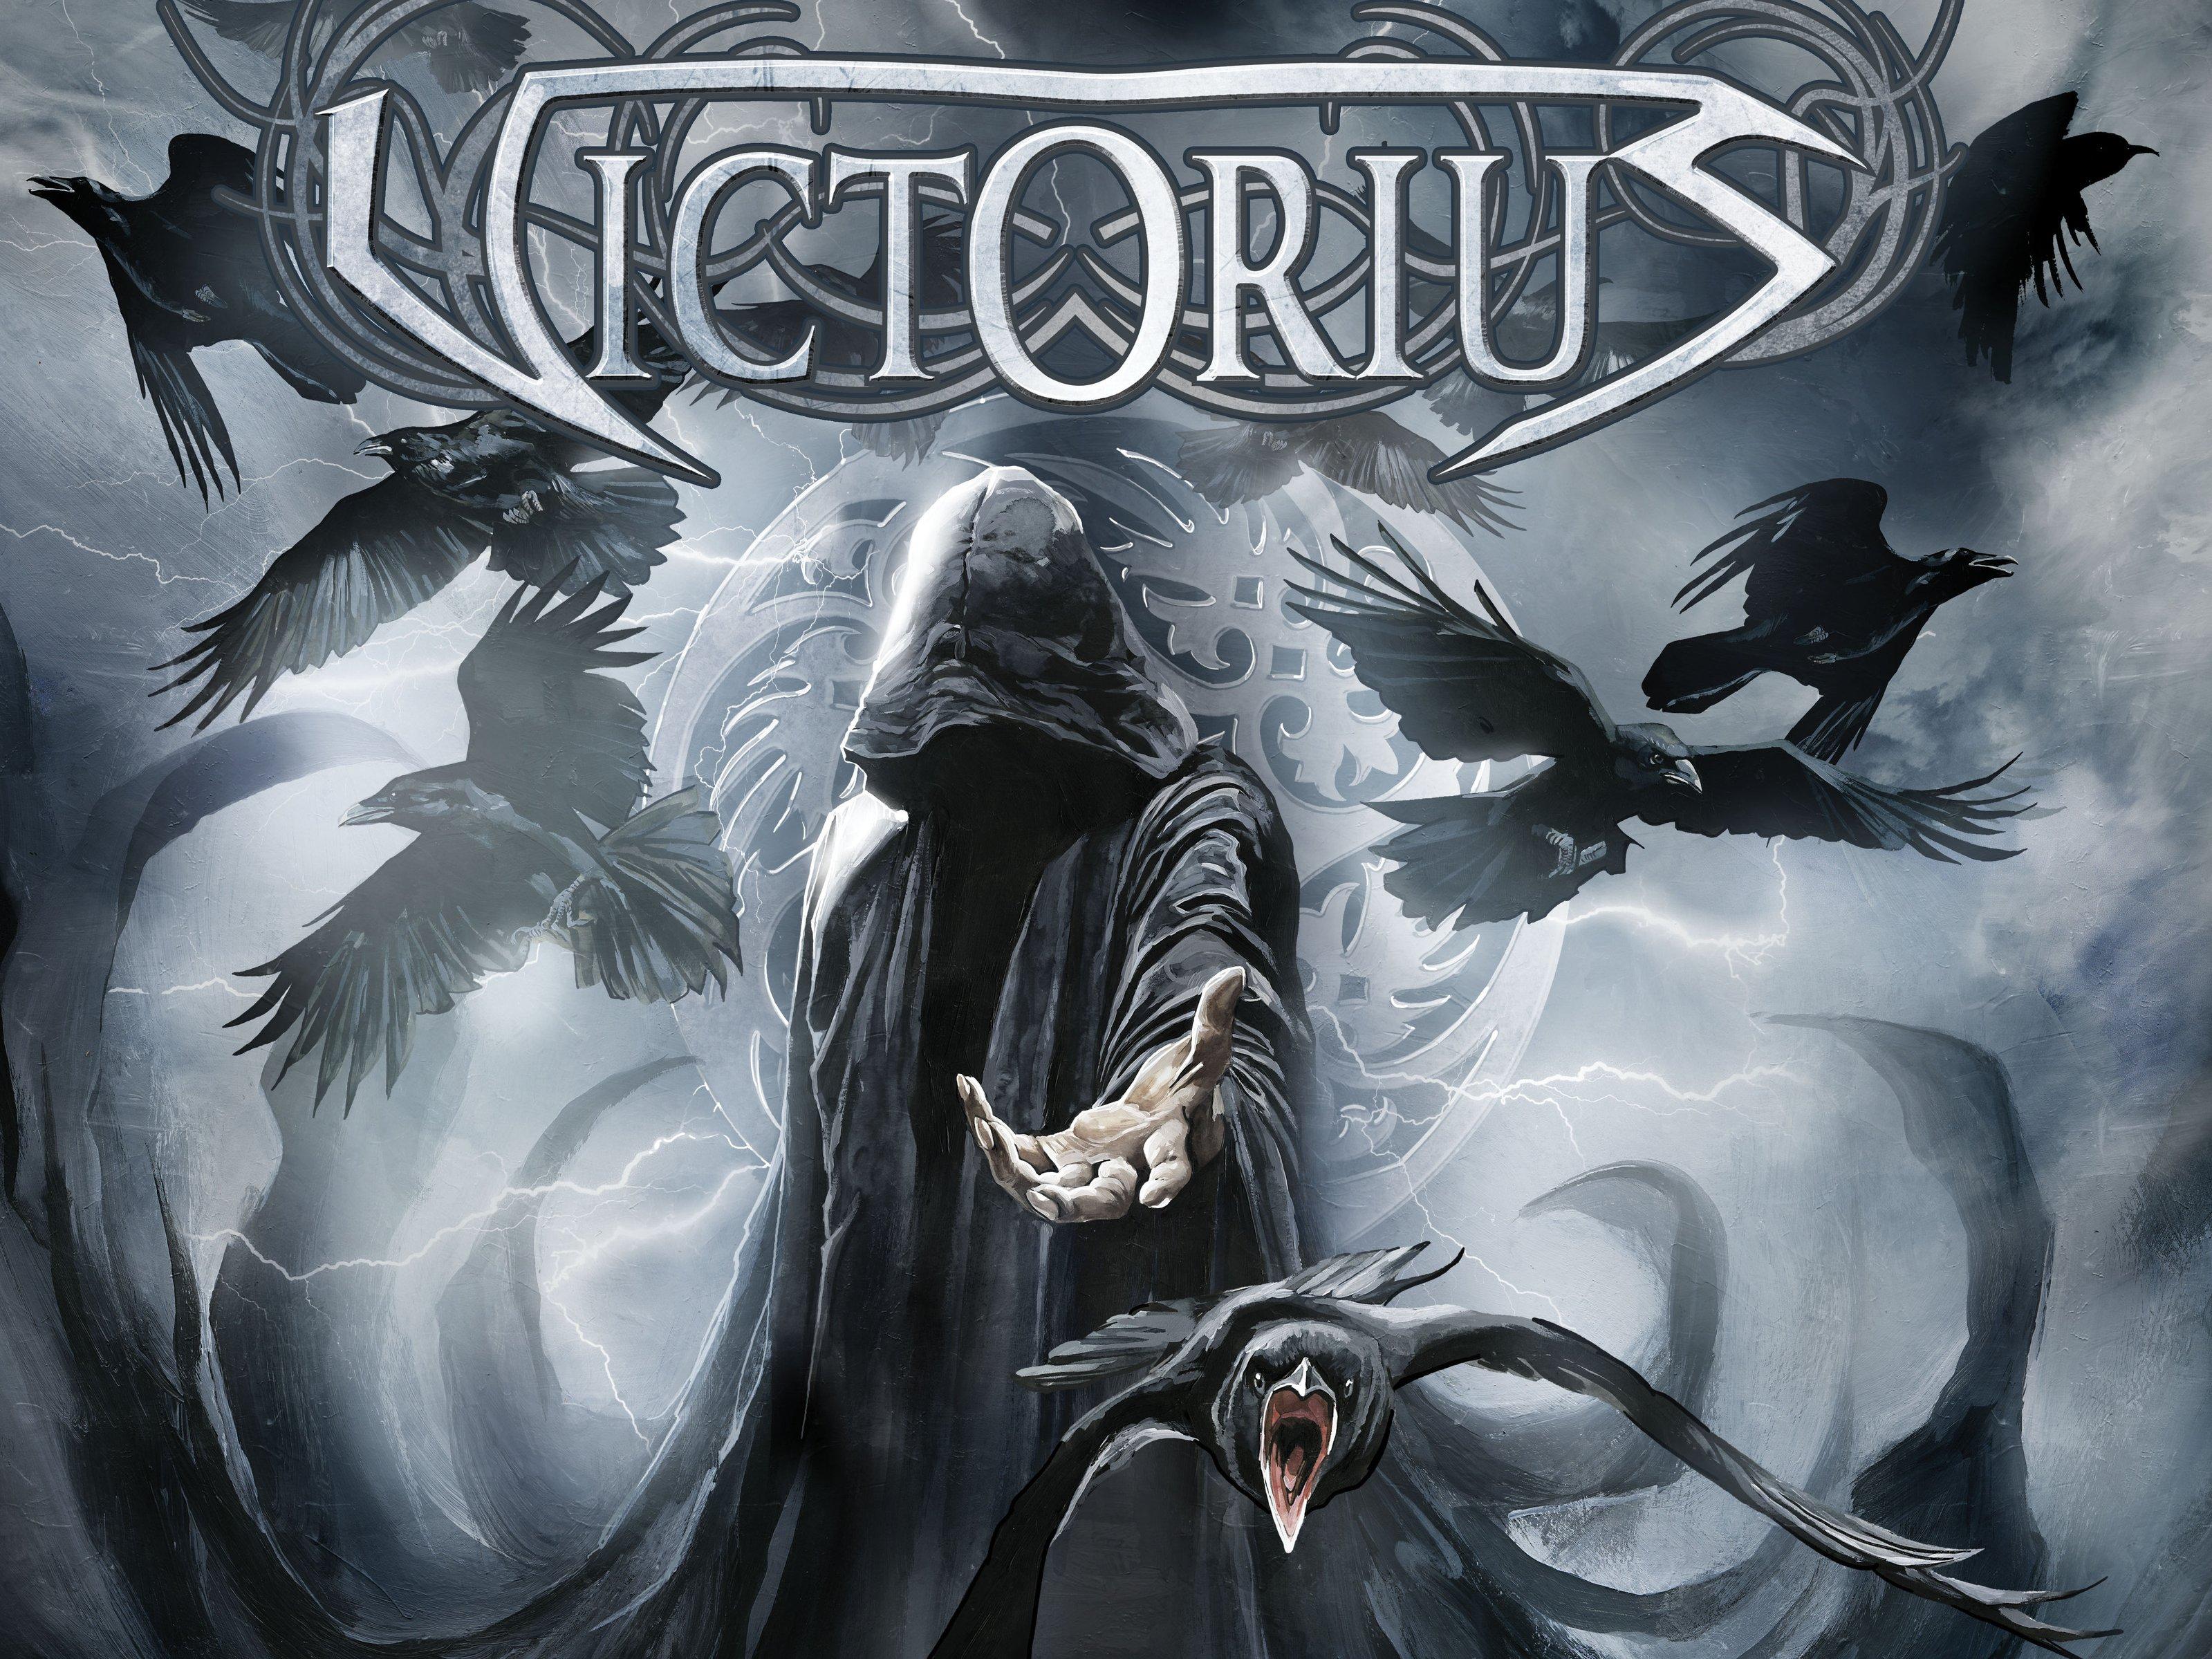 Image for Victorius